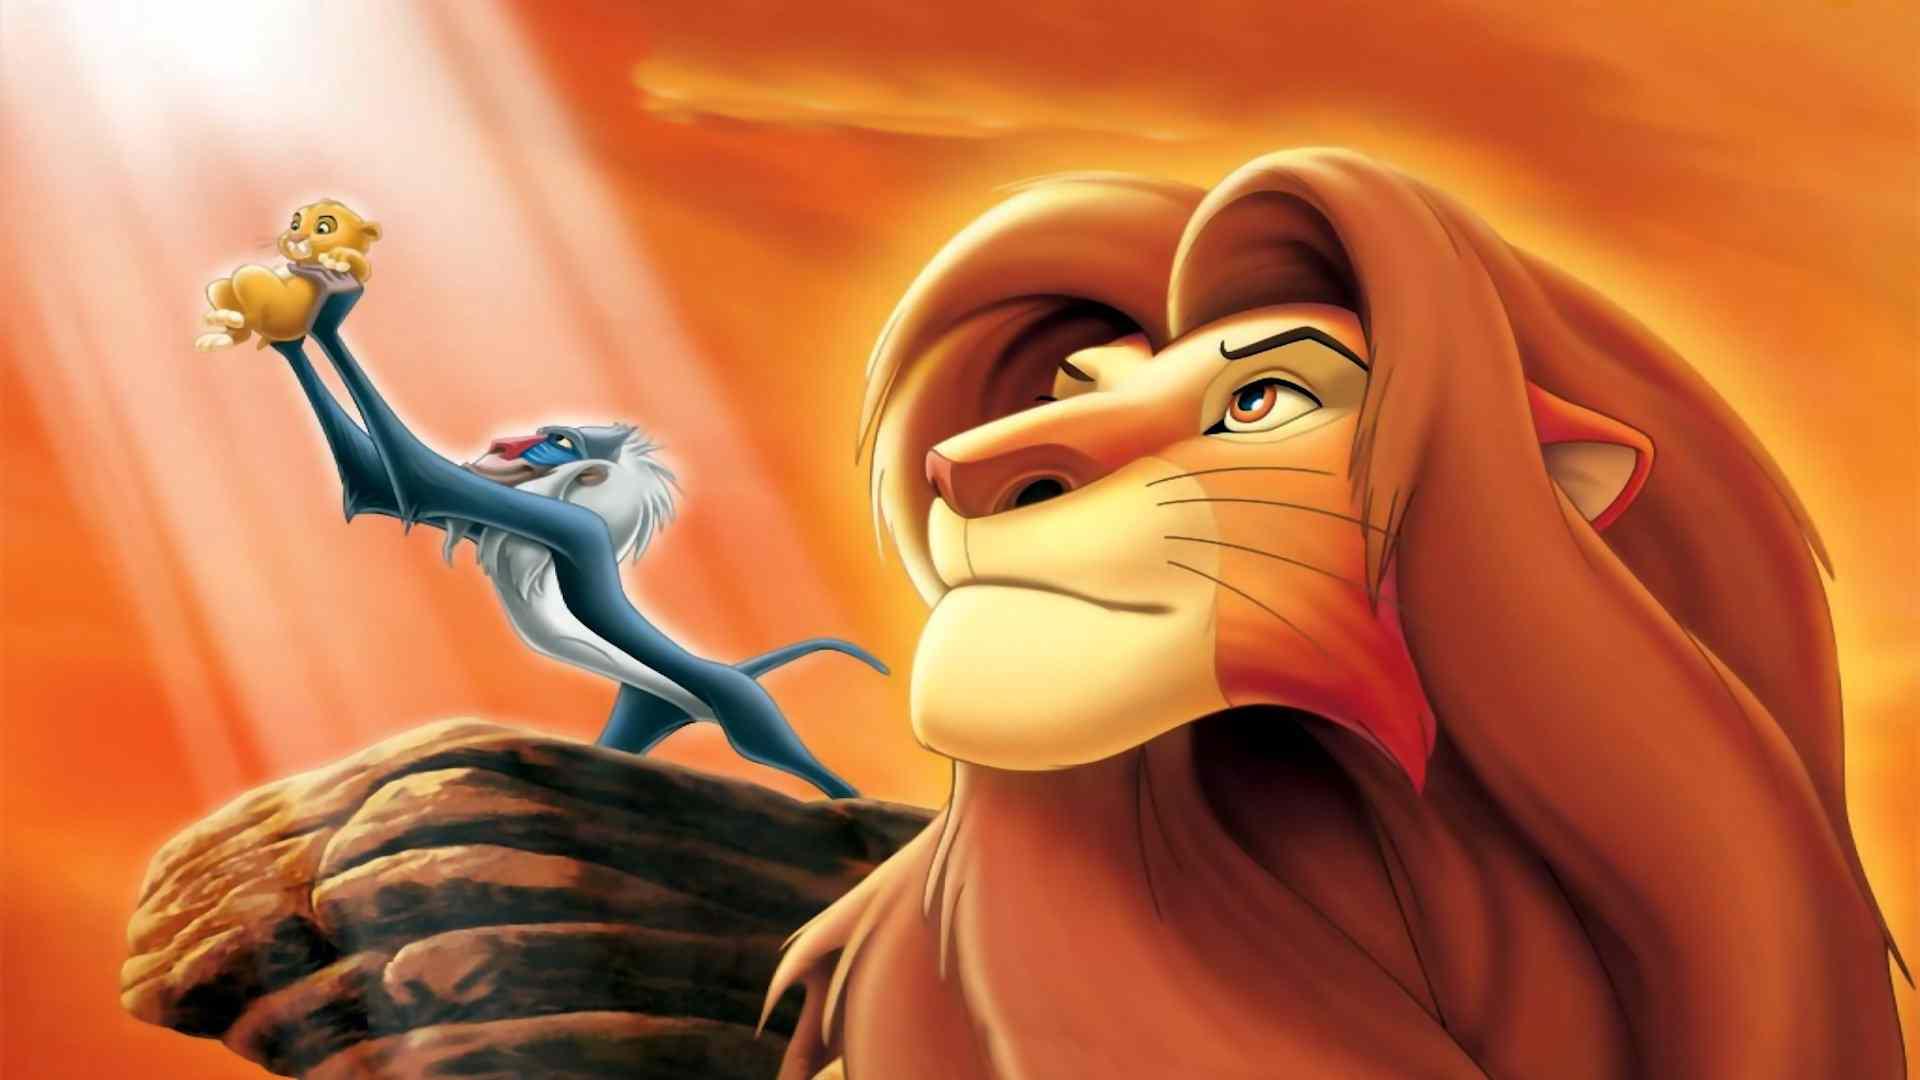 The Lion King Wallpaper Hd Wallpapermonkey The Lion - Samba Lion King , HD Wallpaper & Backgrounds